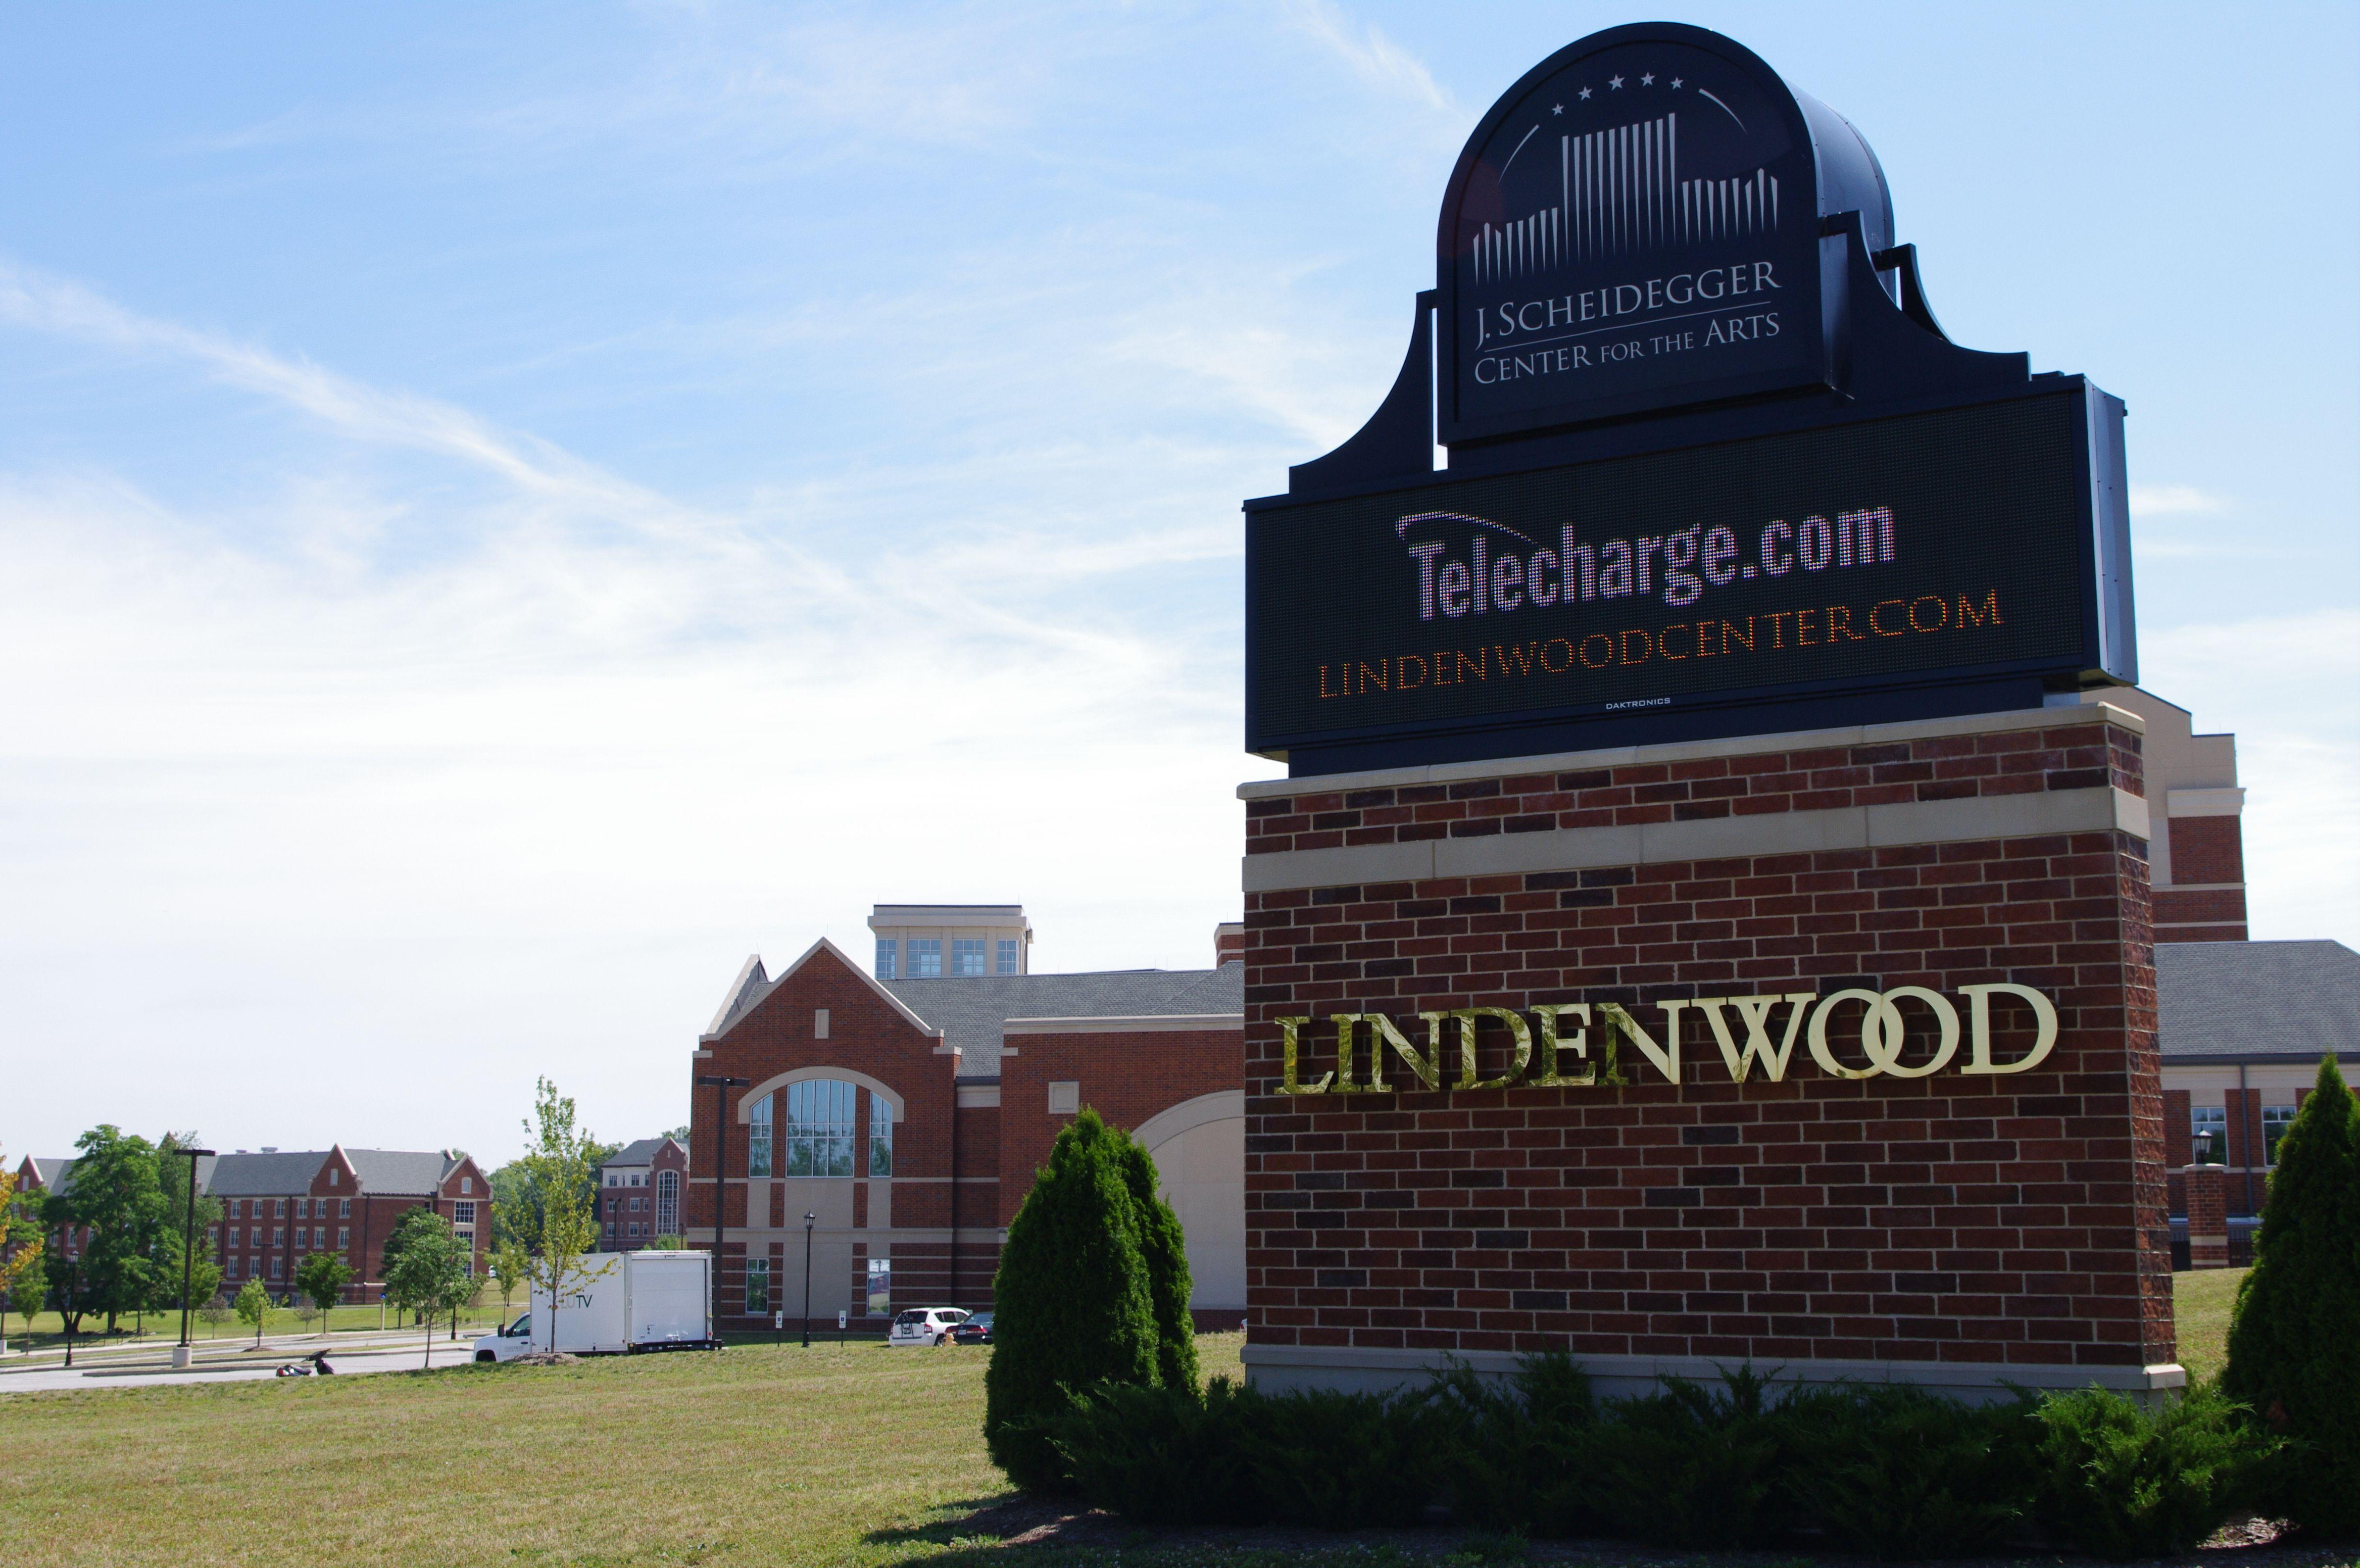 Promotional board for The J. Scheidegger Center | www.lindenwood.edu